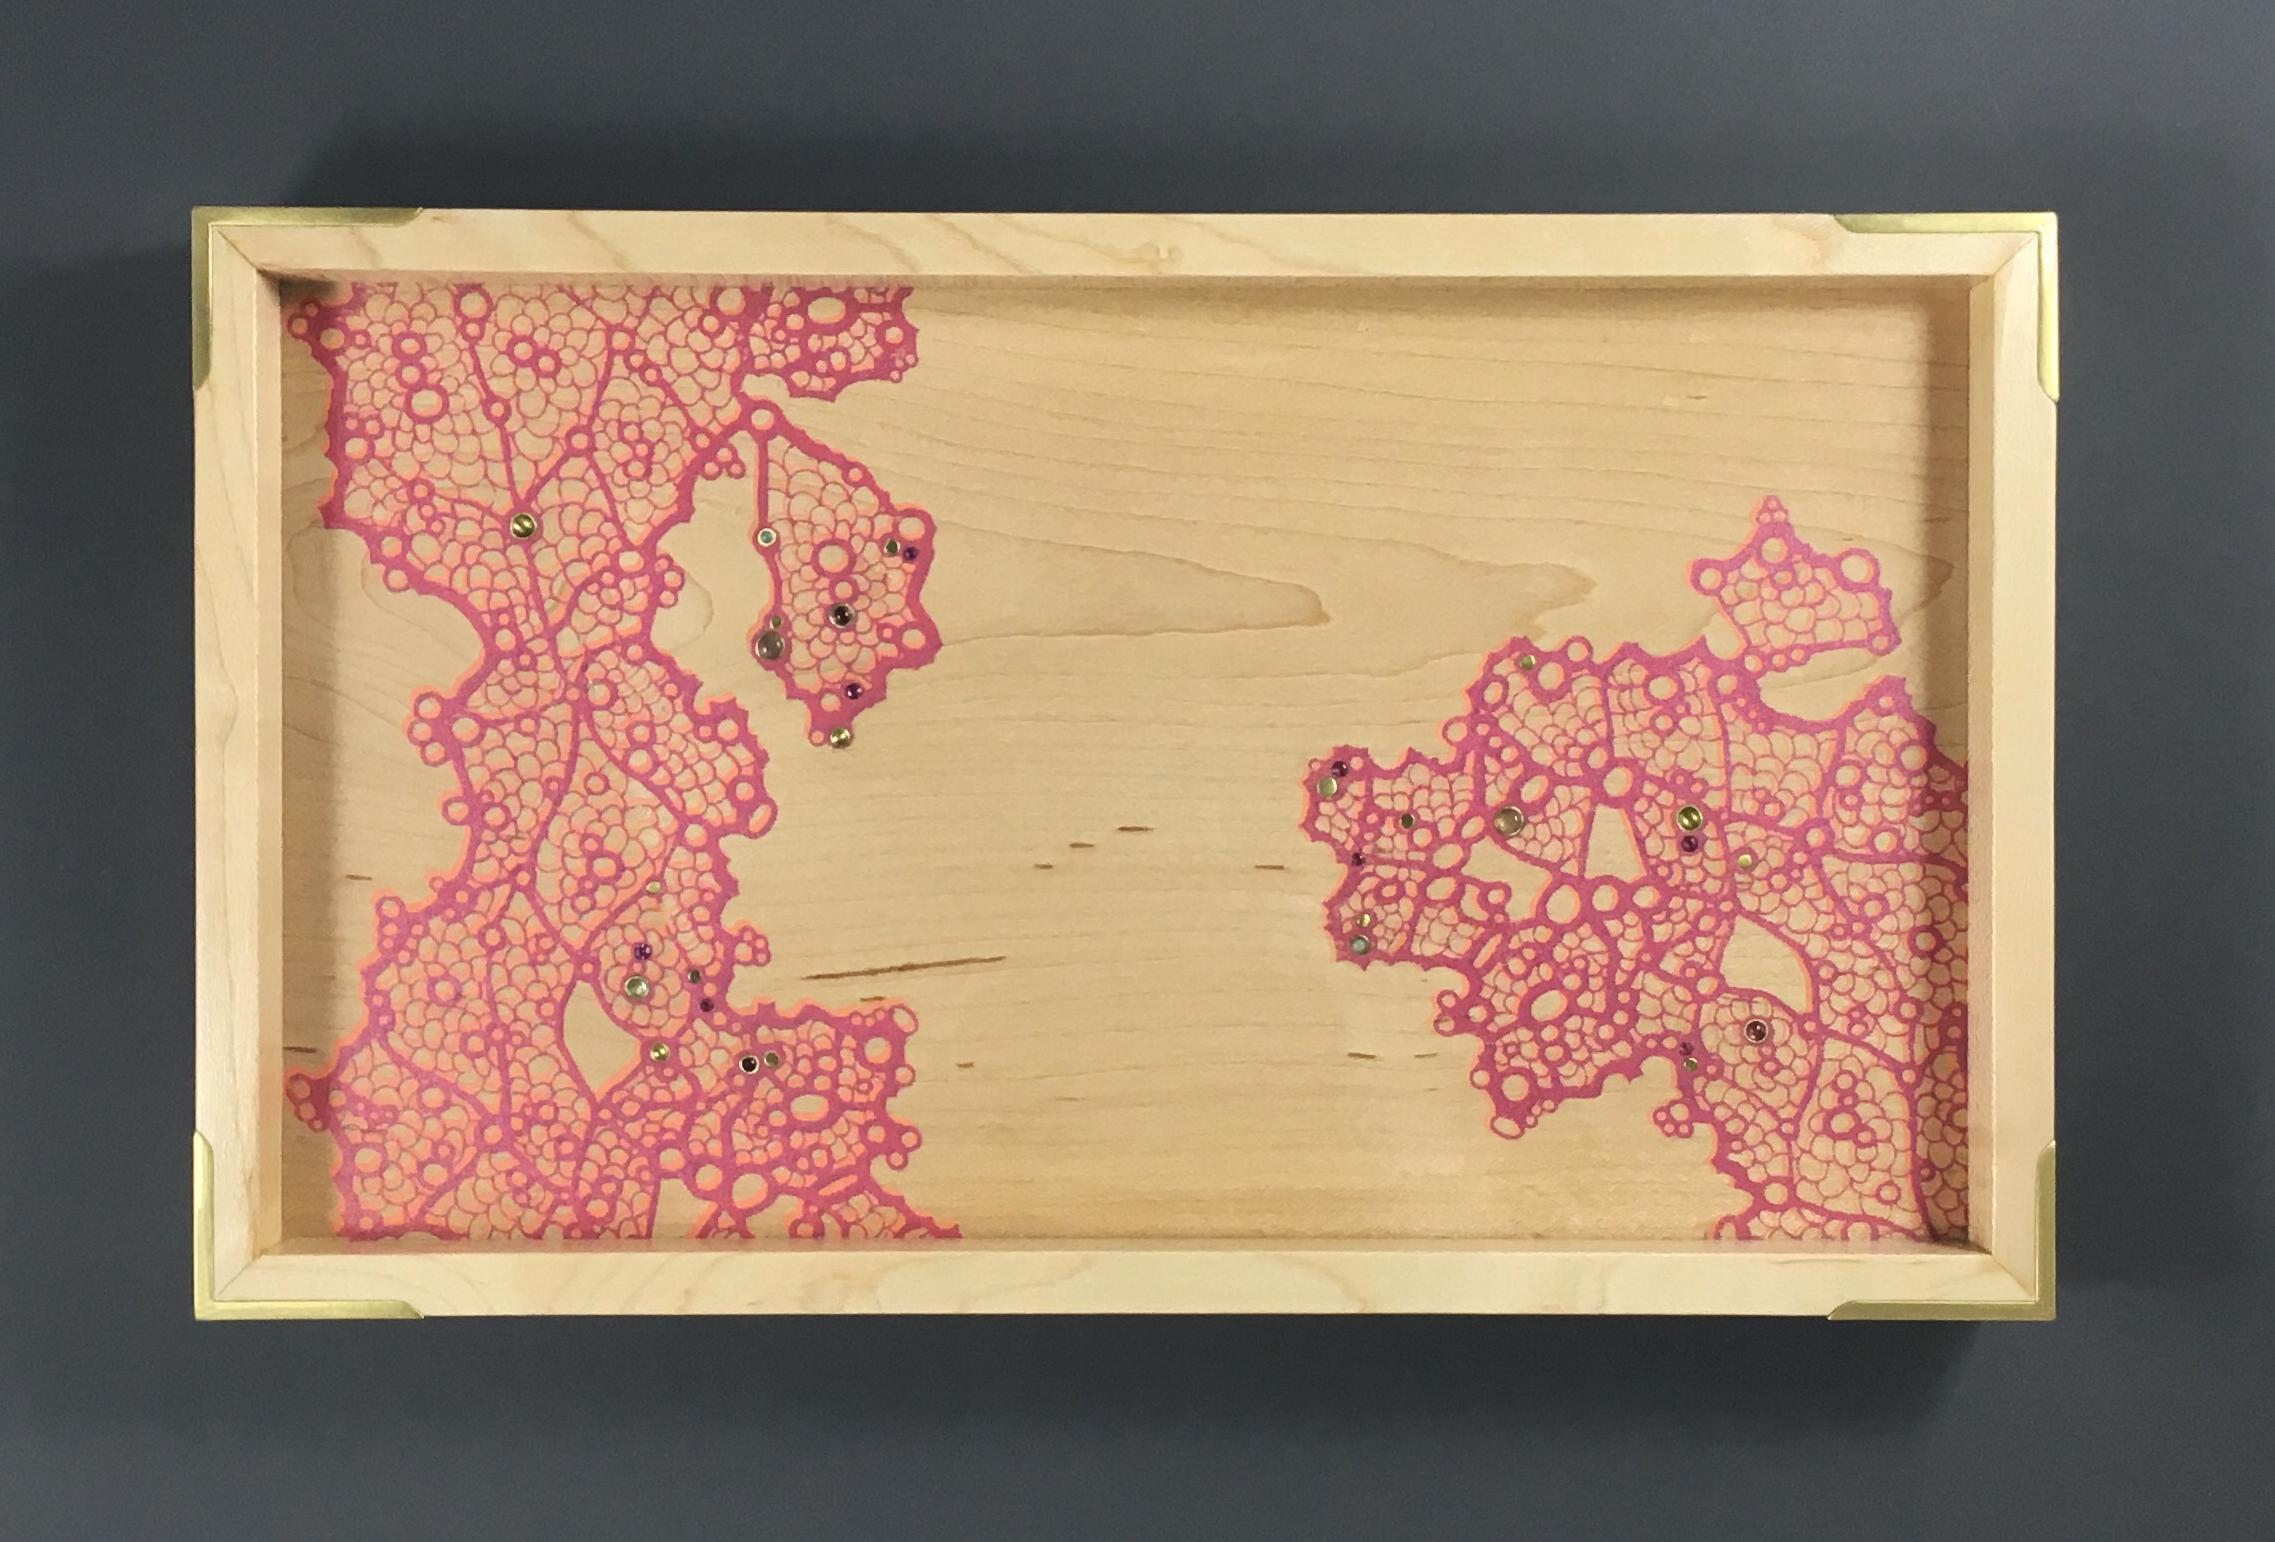 "lace  tray, maple, 11.5"" x 7"" x 1.25"", brass, rhodolite, moonstone, opal, and tourmaline gemstones, $200"